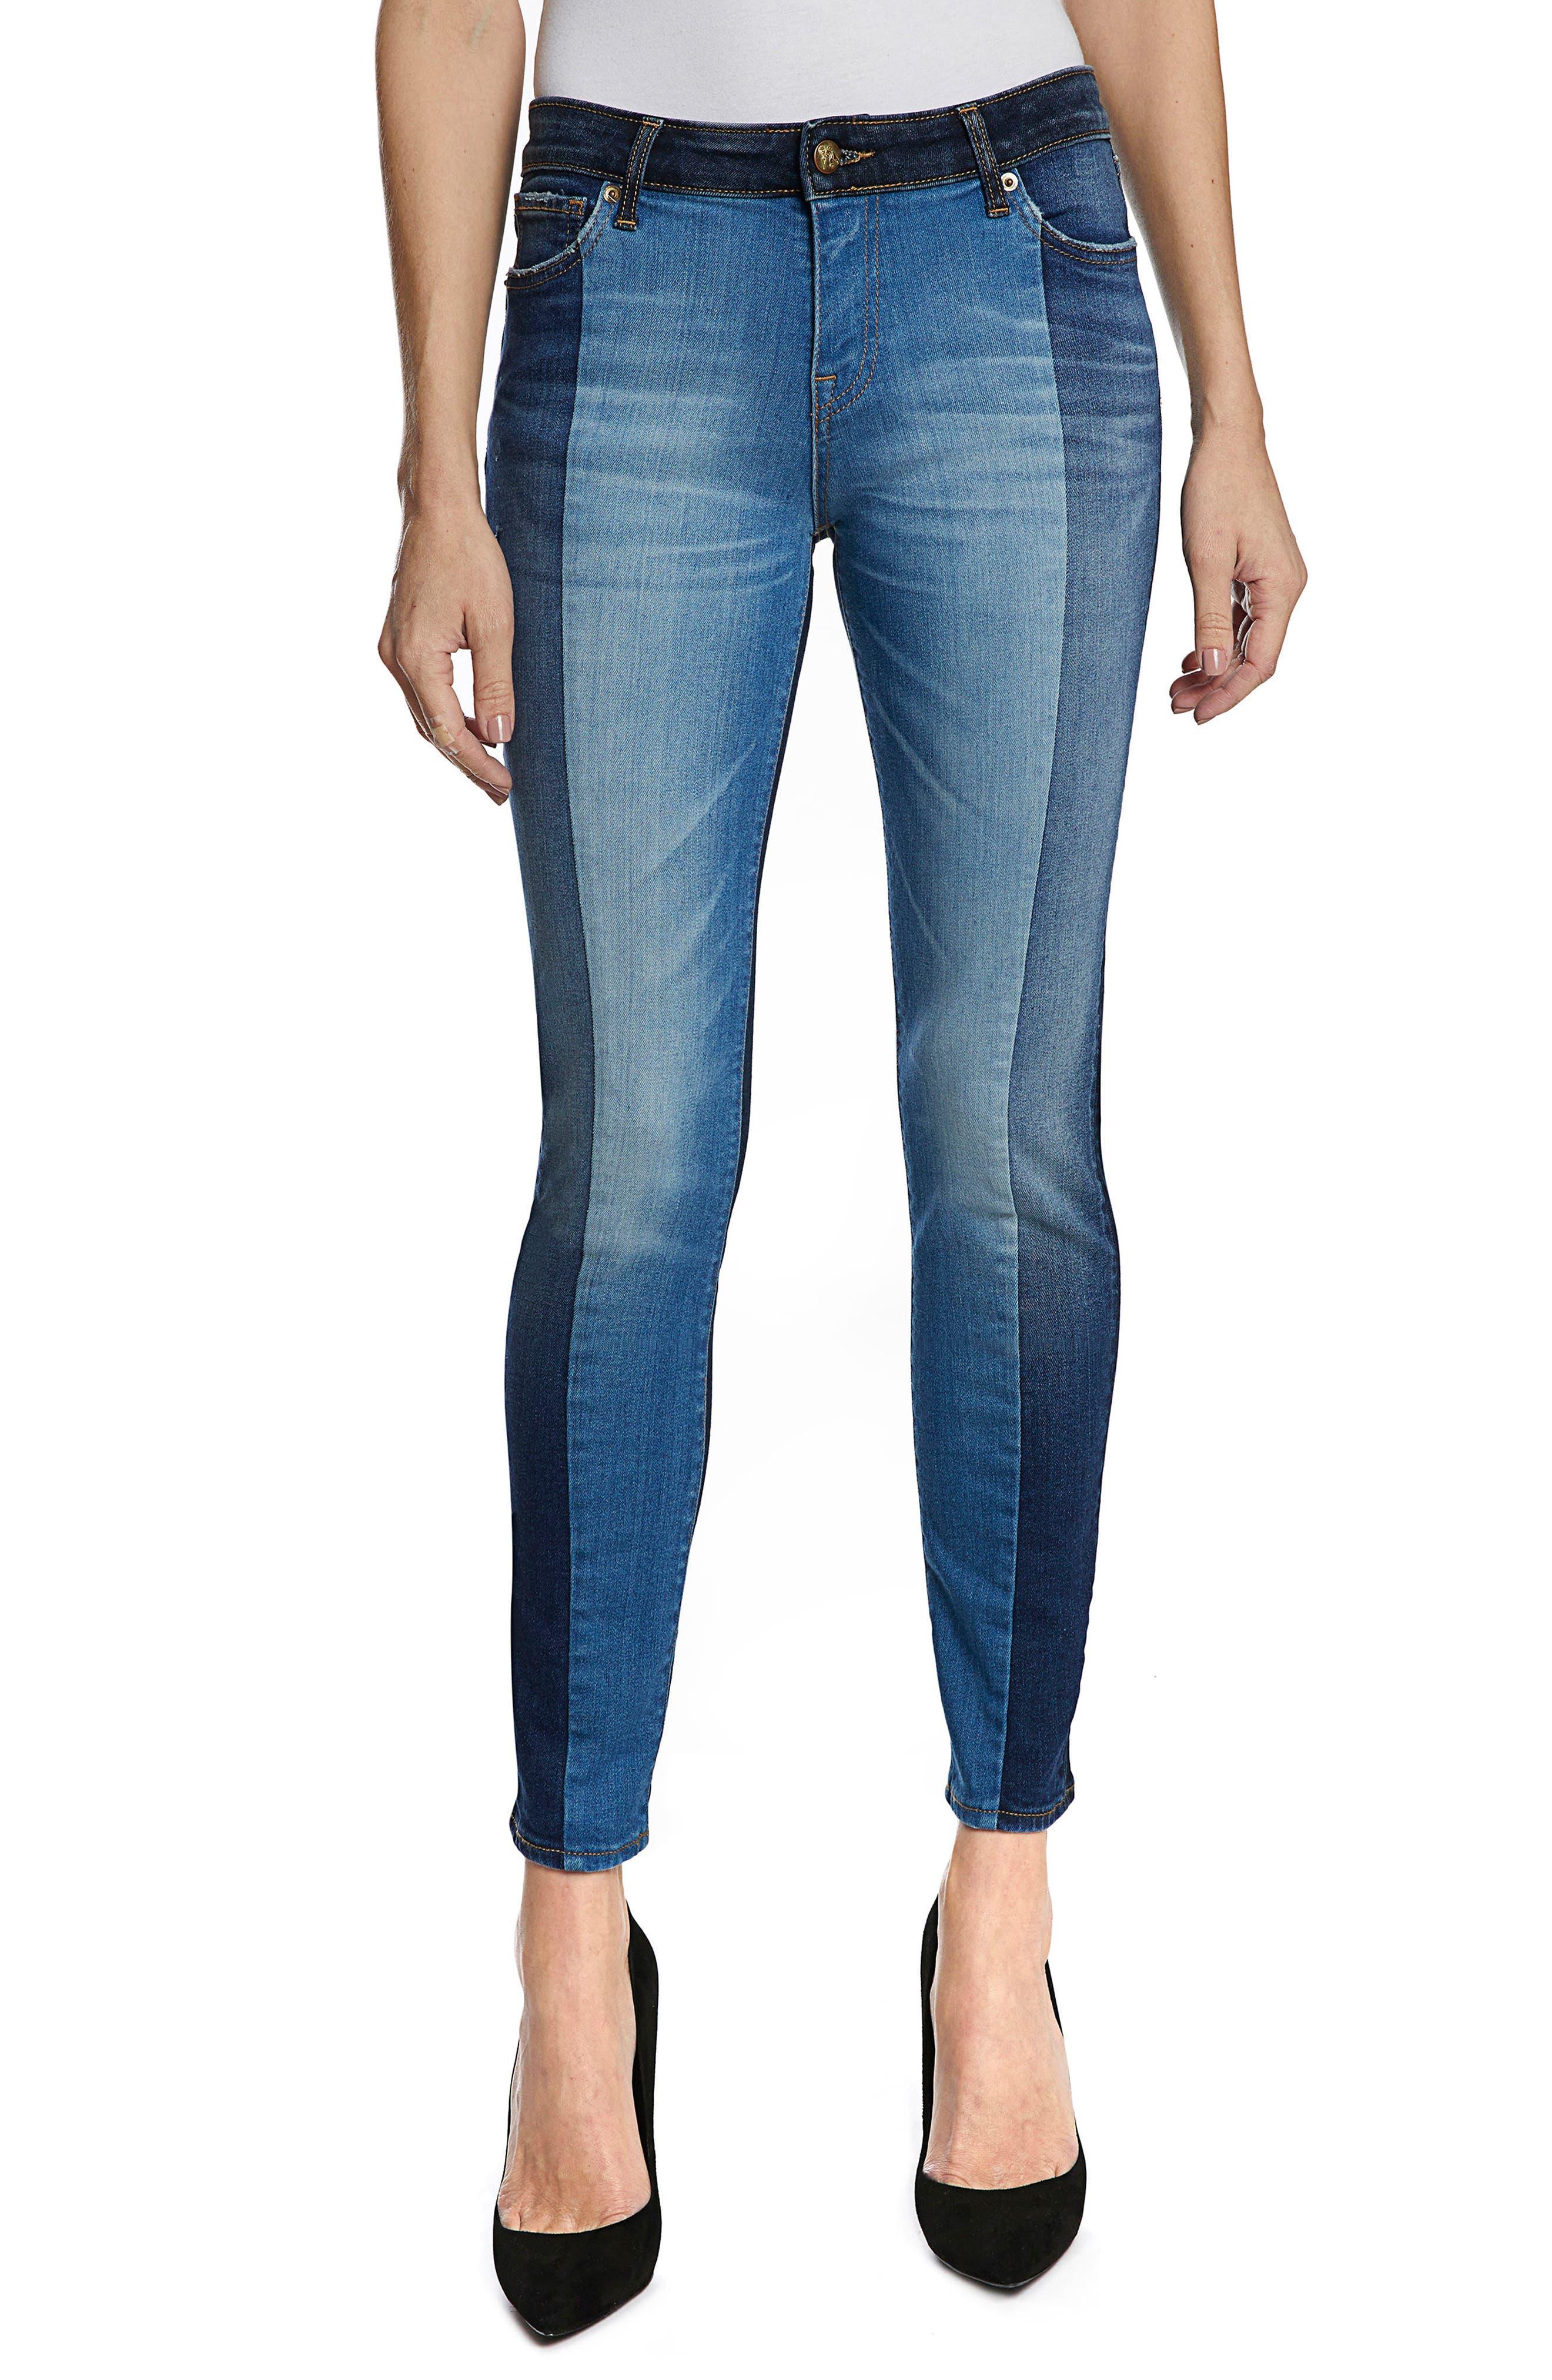 Camaro Ankle Skinny Jeans,                         Main,                         color, Indigo